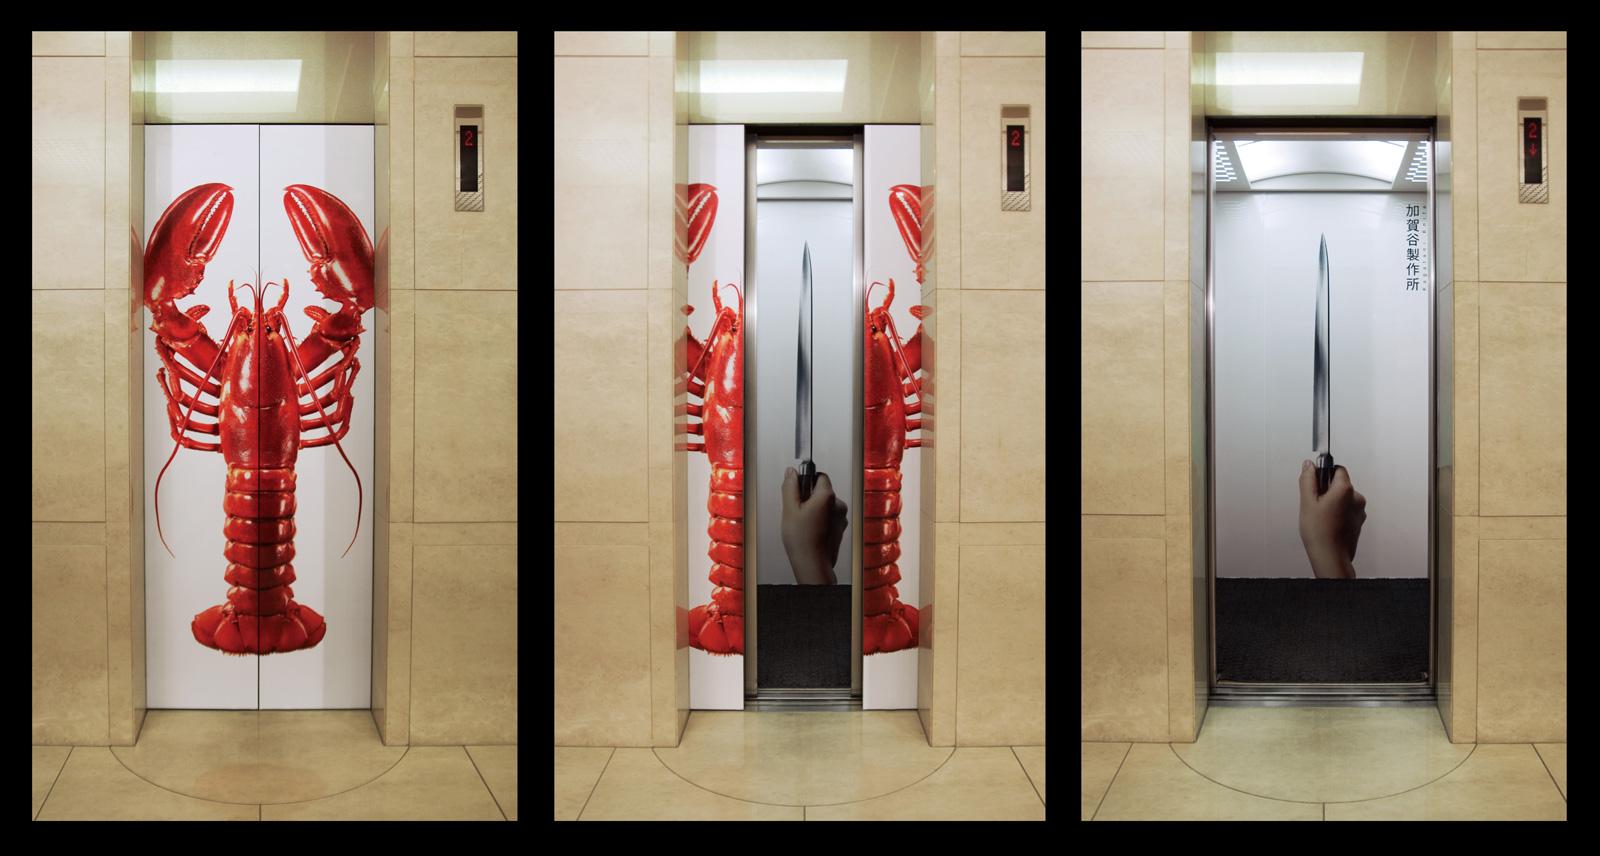 Top 27 Creative Elevator Advertisements